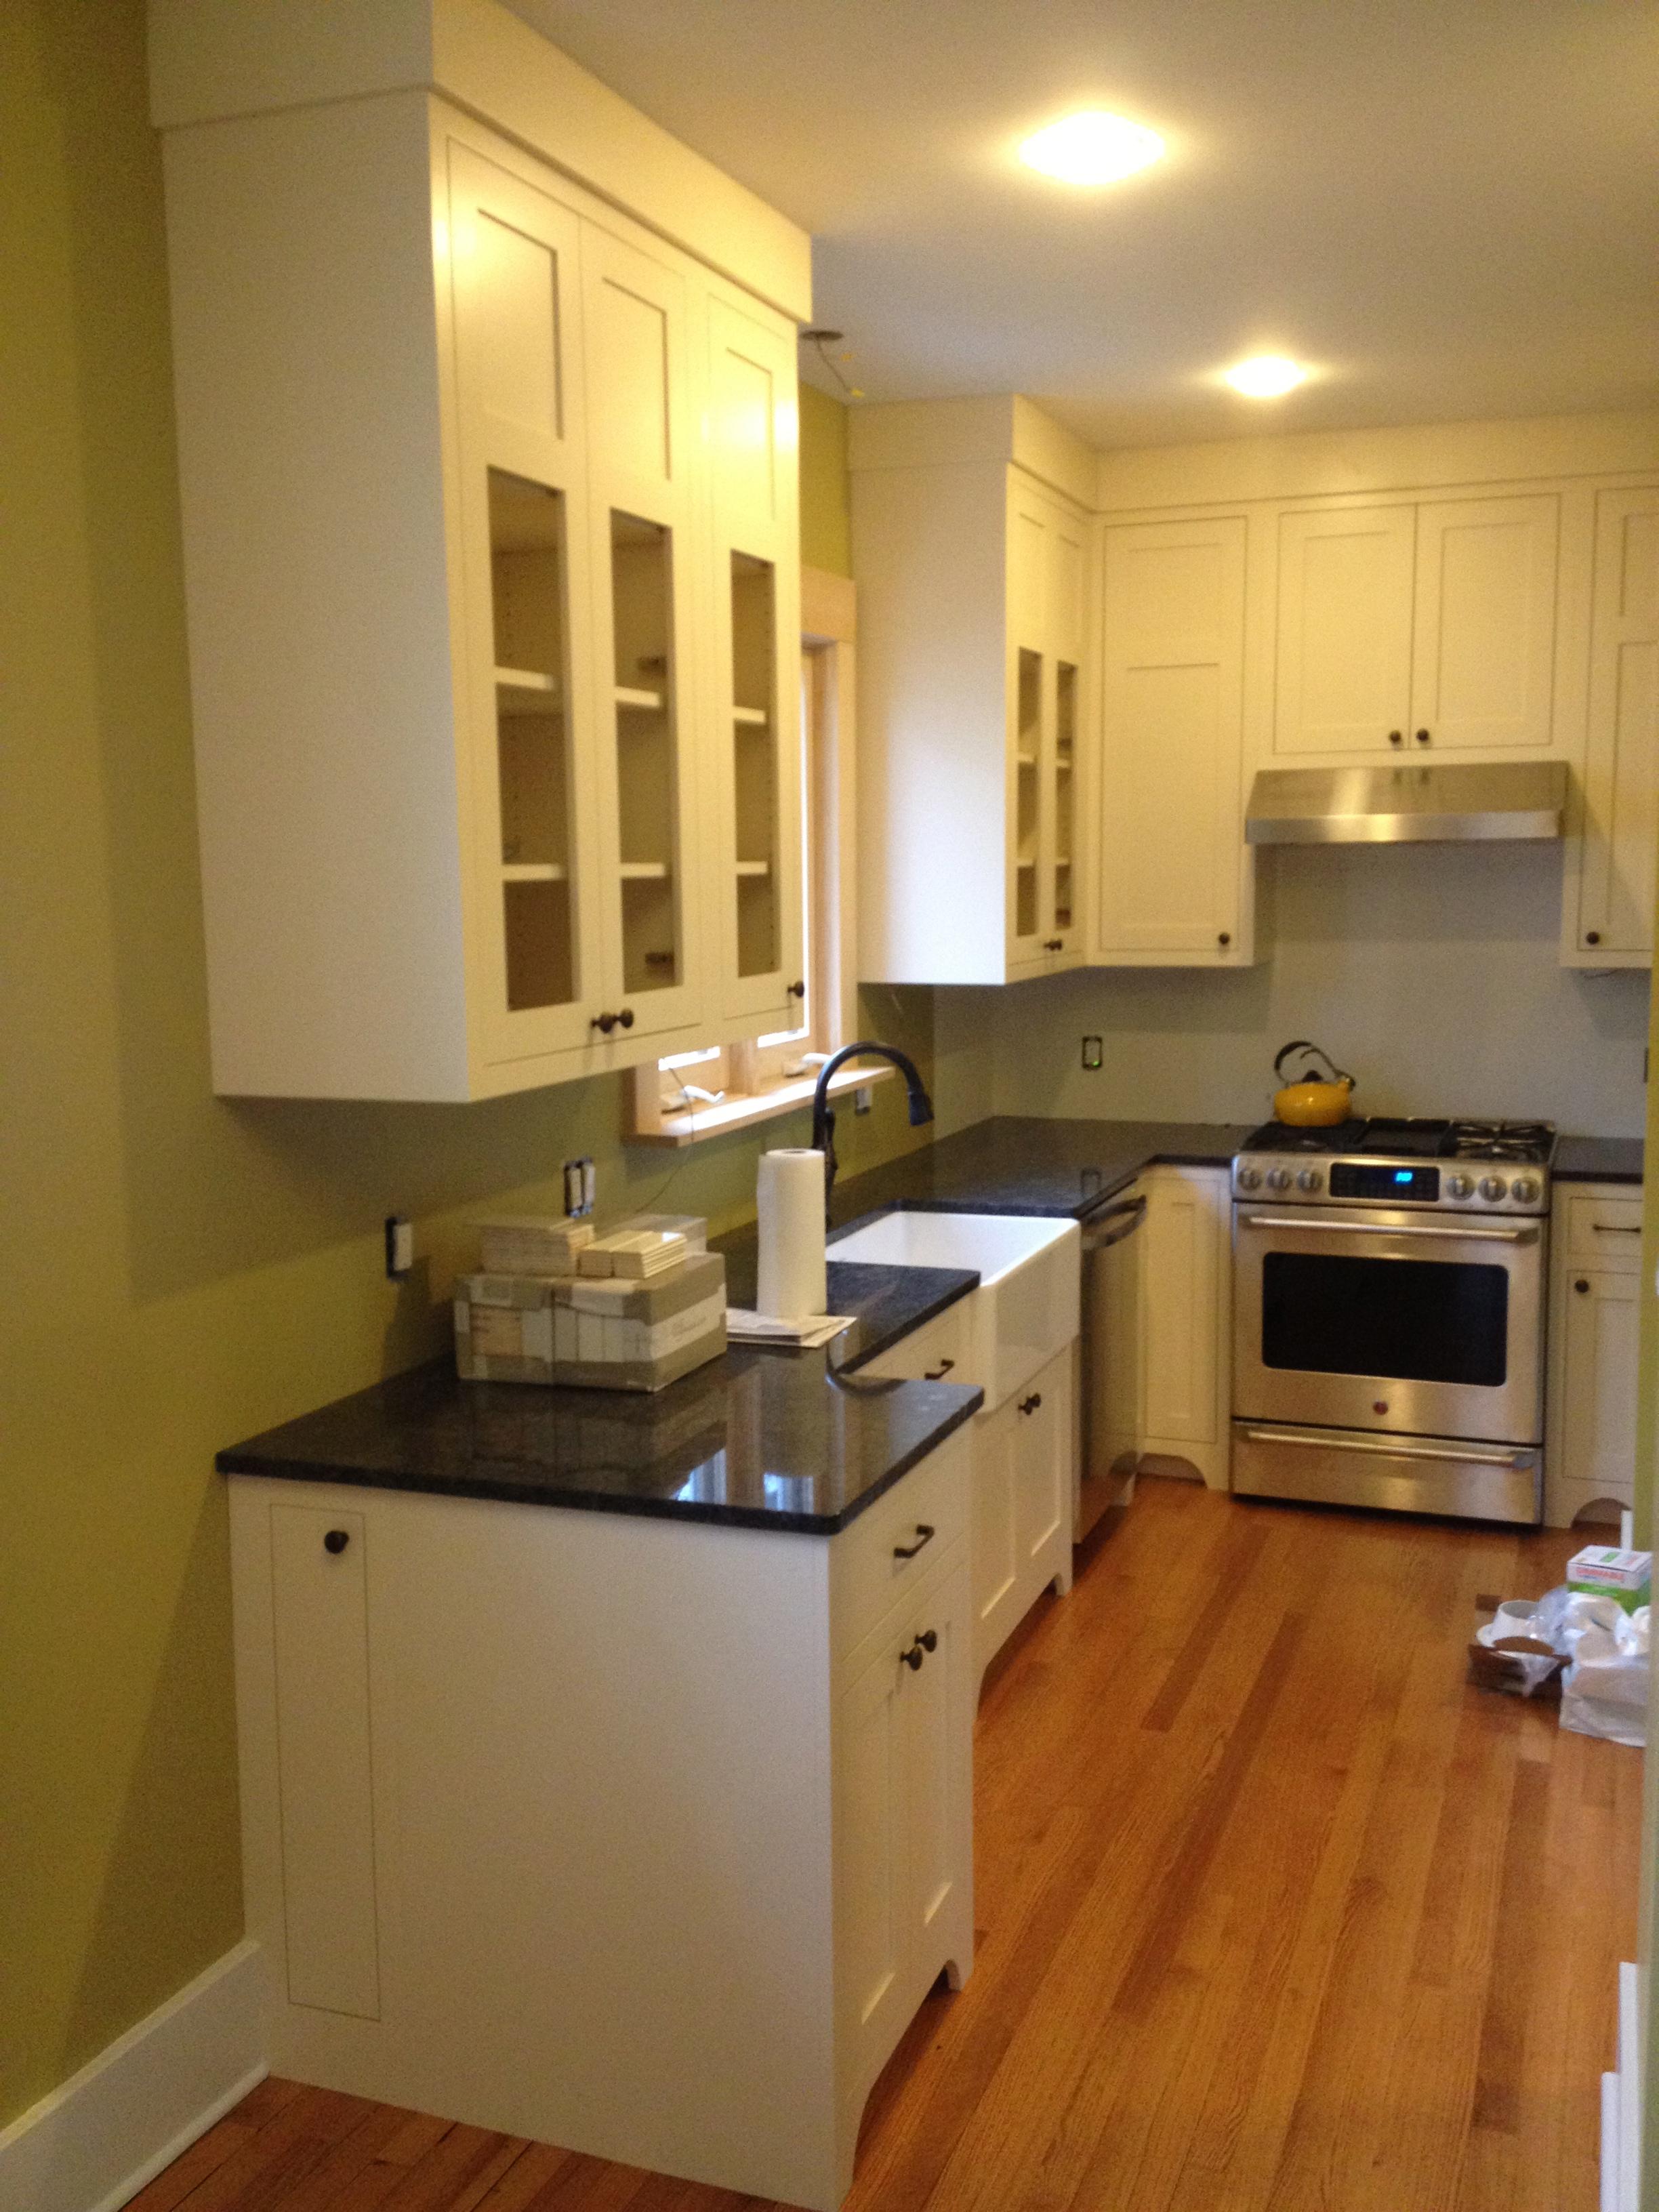 Haek kitchen remodel 12-2.jpg